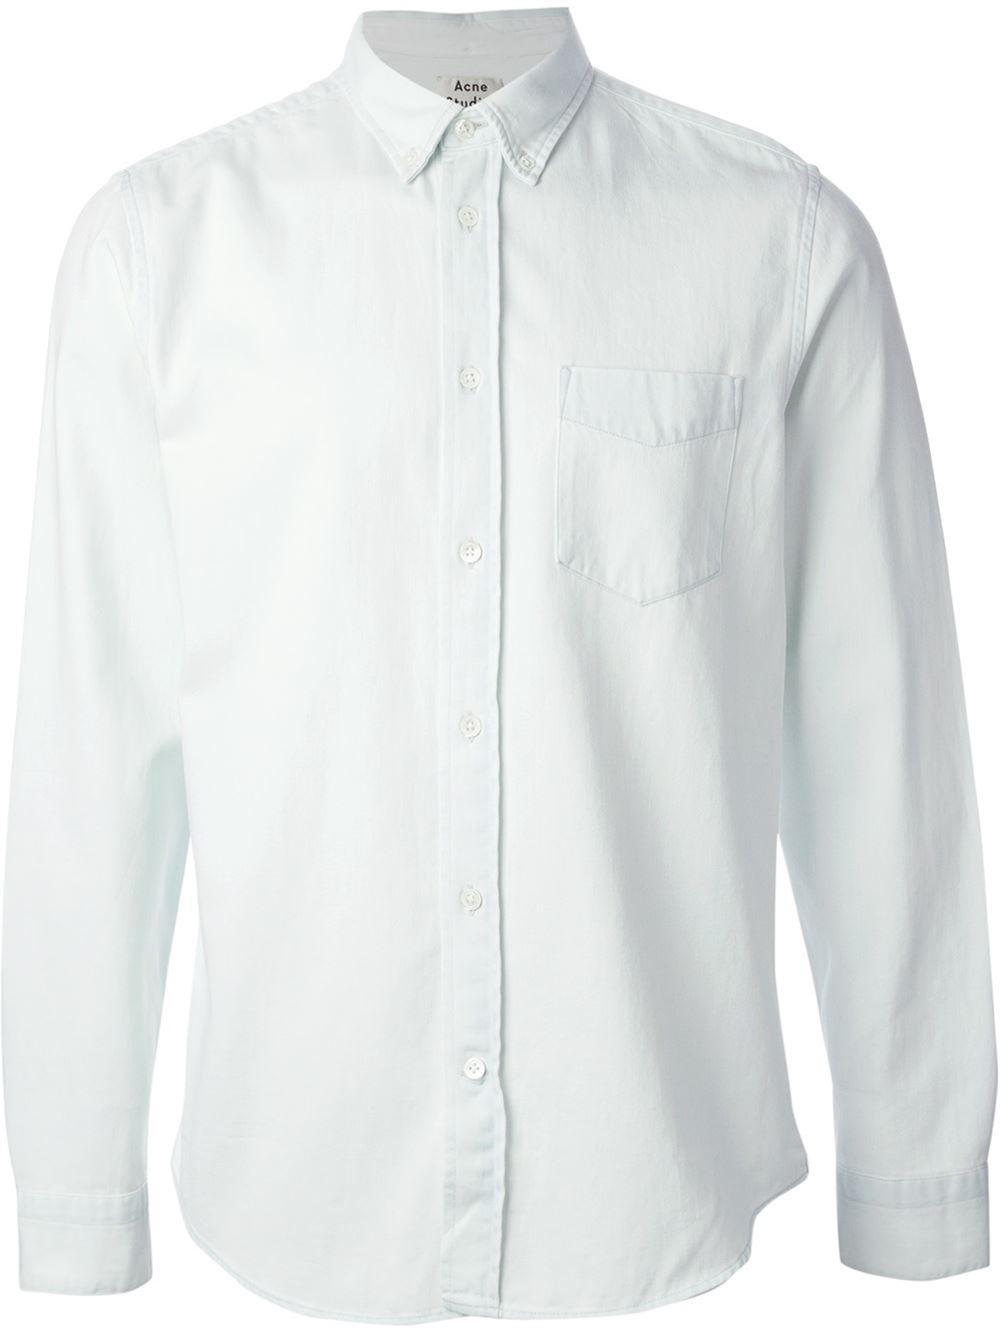 9c04b42dbca Lyst - Acne Studios  Isherwood  Denim Shirt in Blue for Men